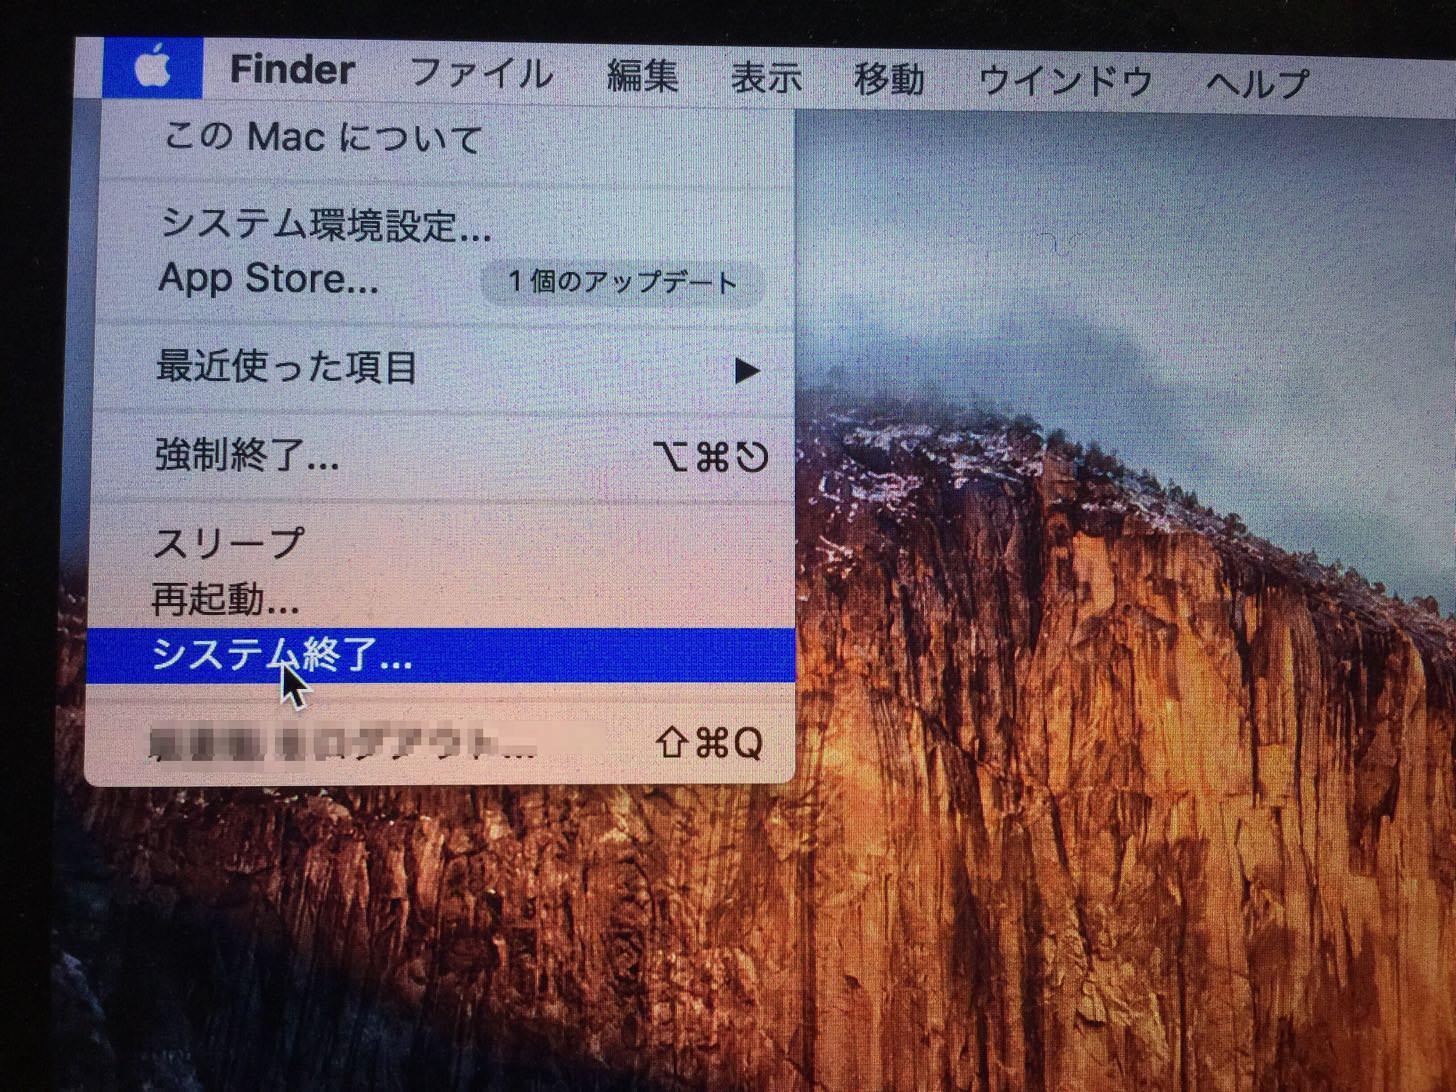 OS X El Capitanをシステム終了する